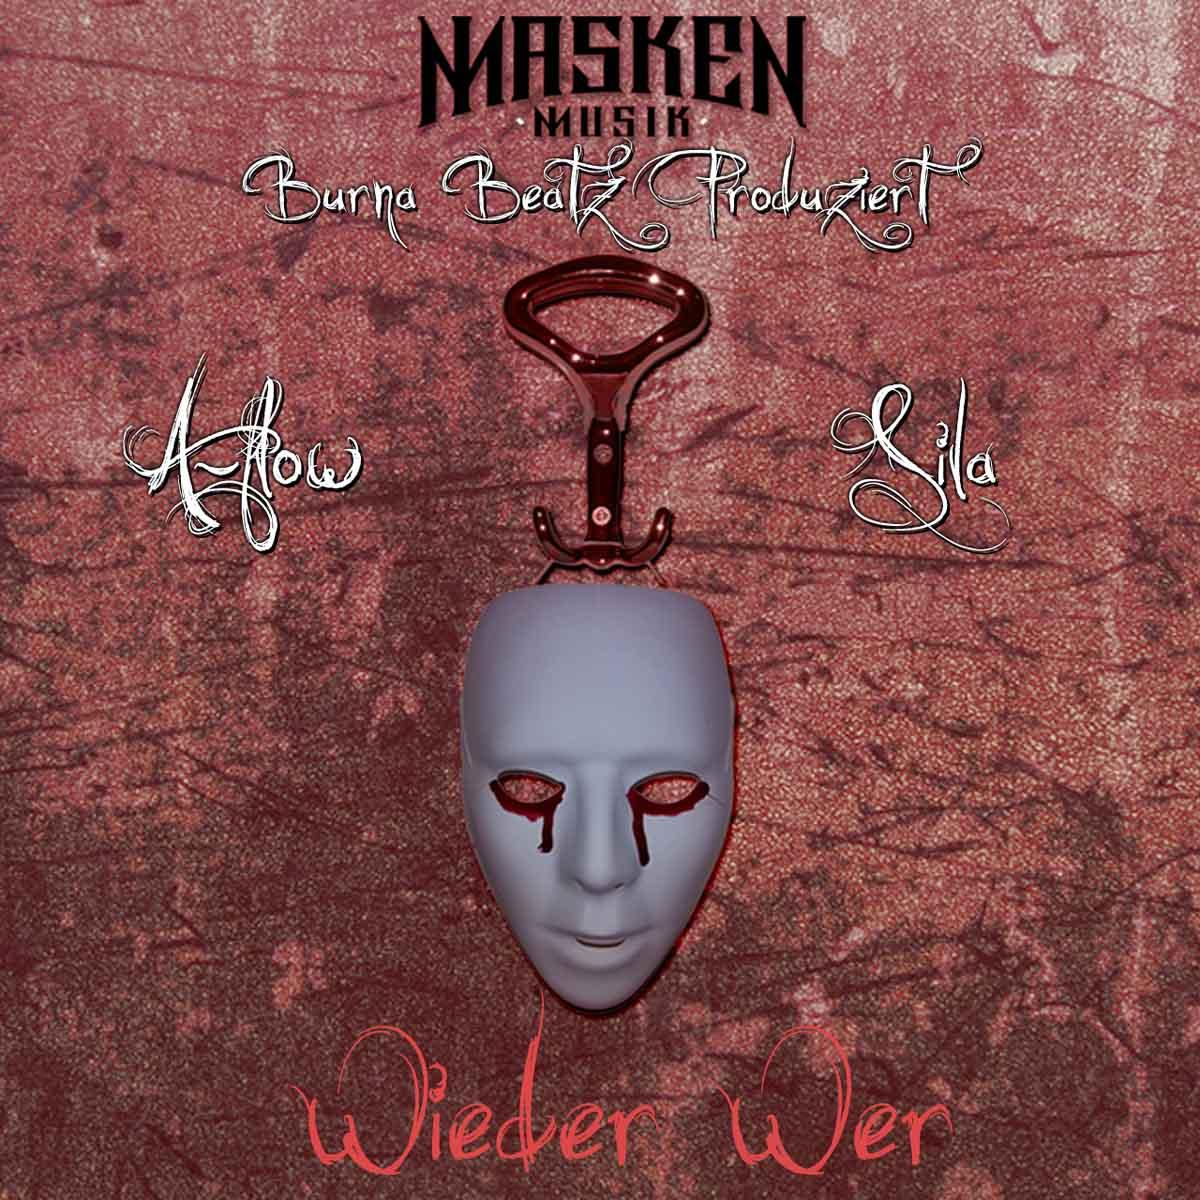 Upcoming: A-flow & Sila - Wieder Wer